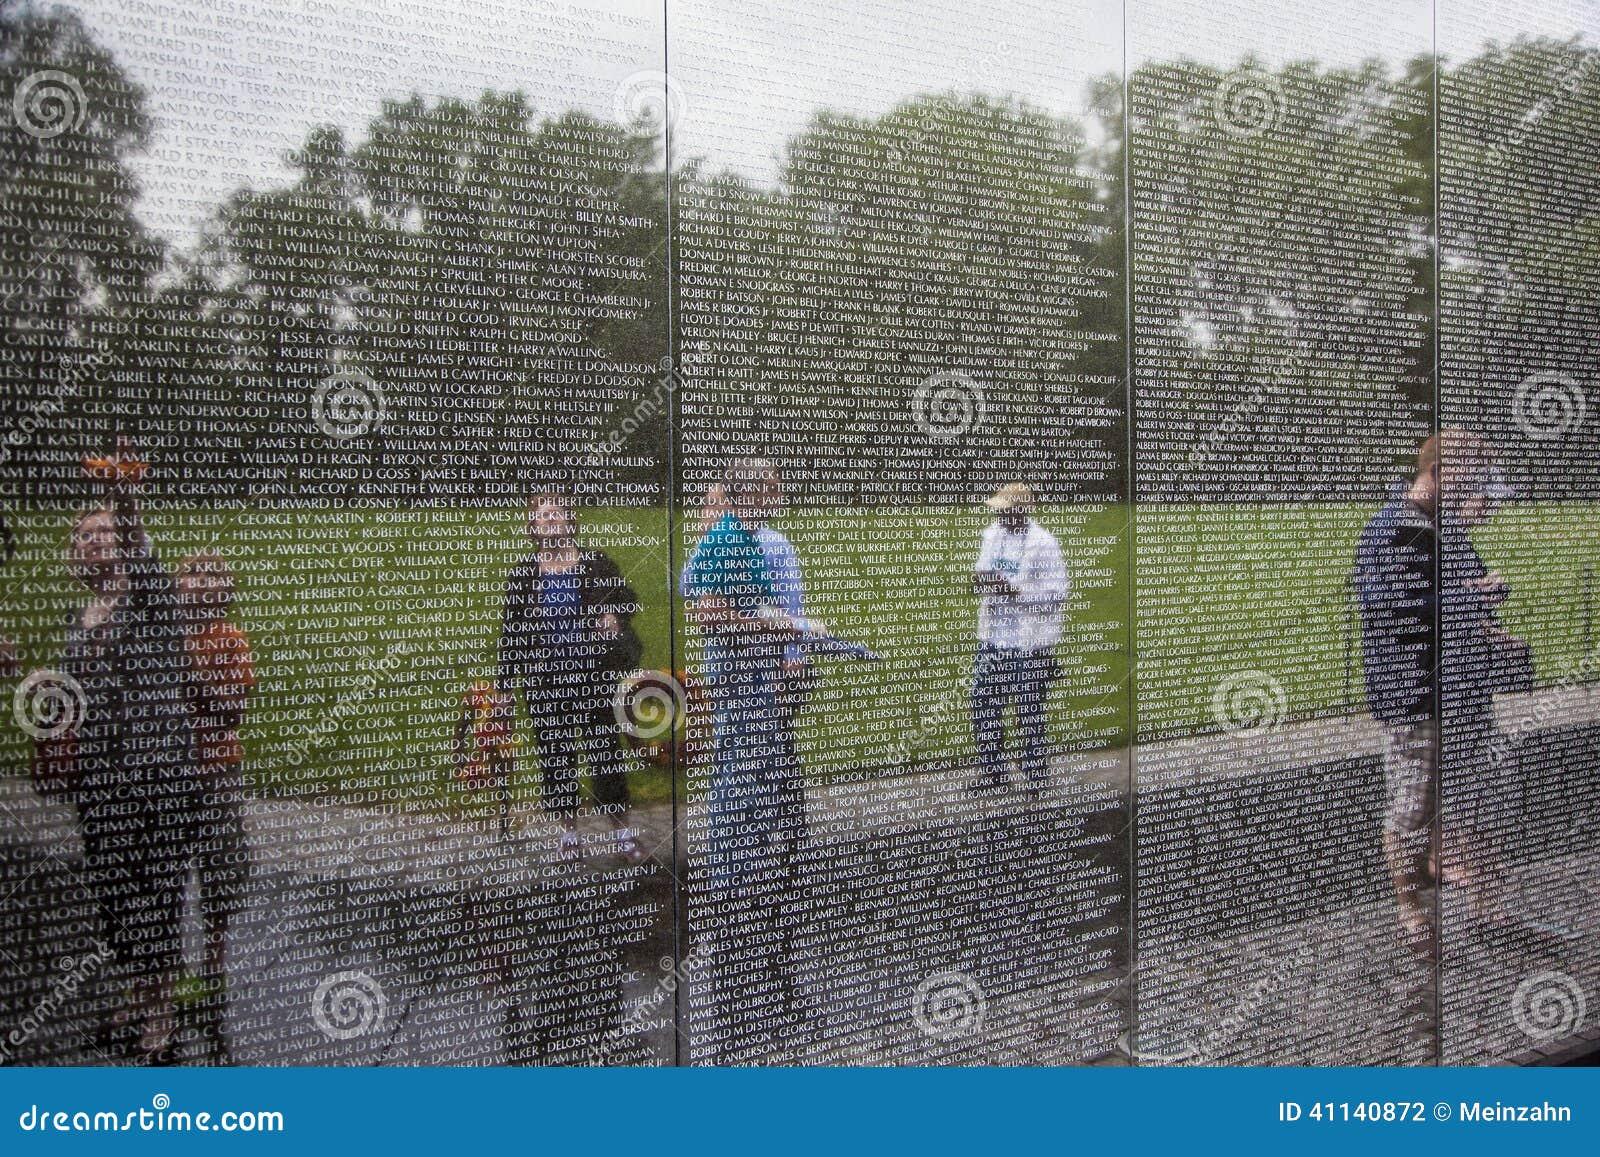 Nombres de las muertes de la guerra de Vietnam en